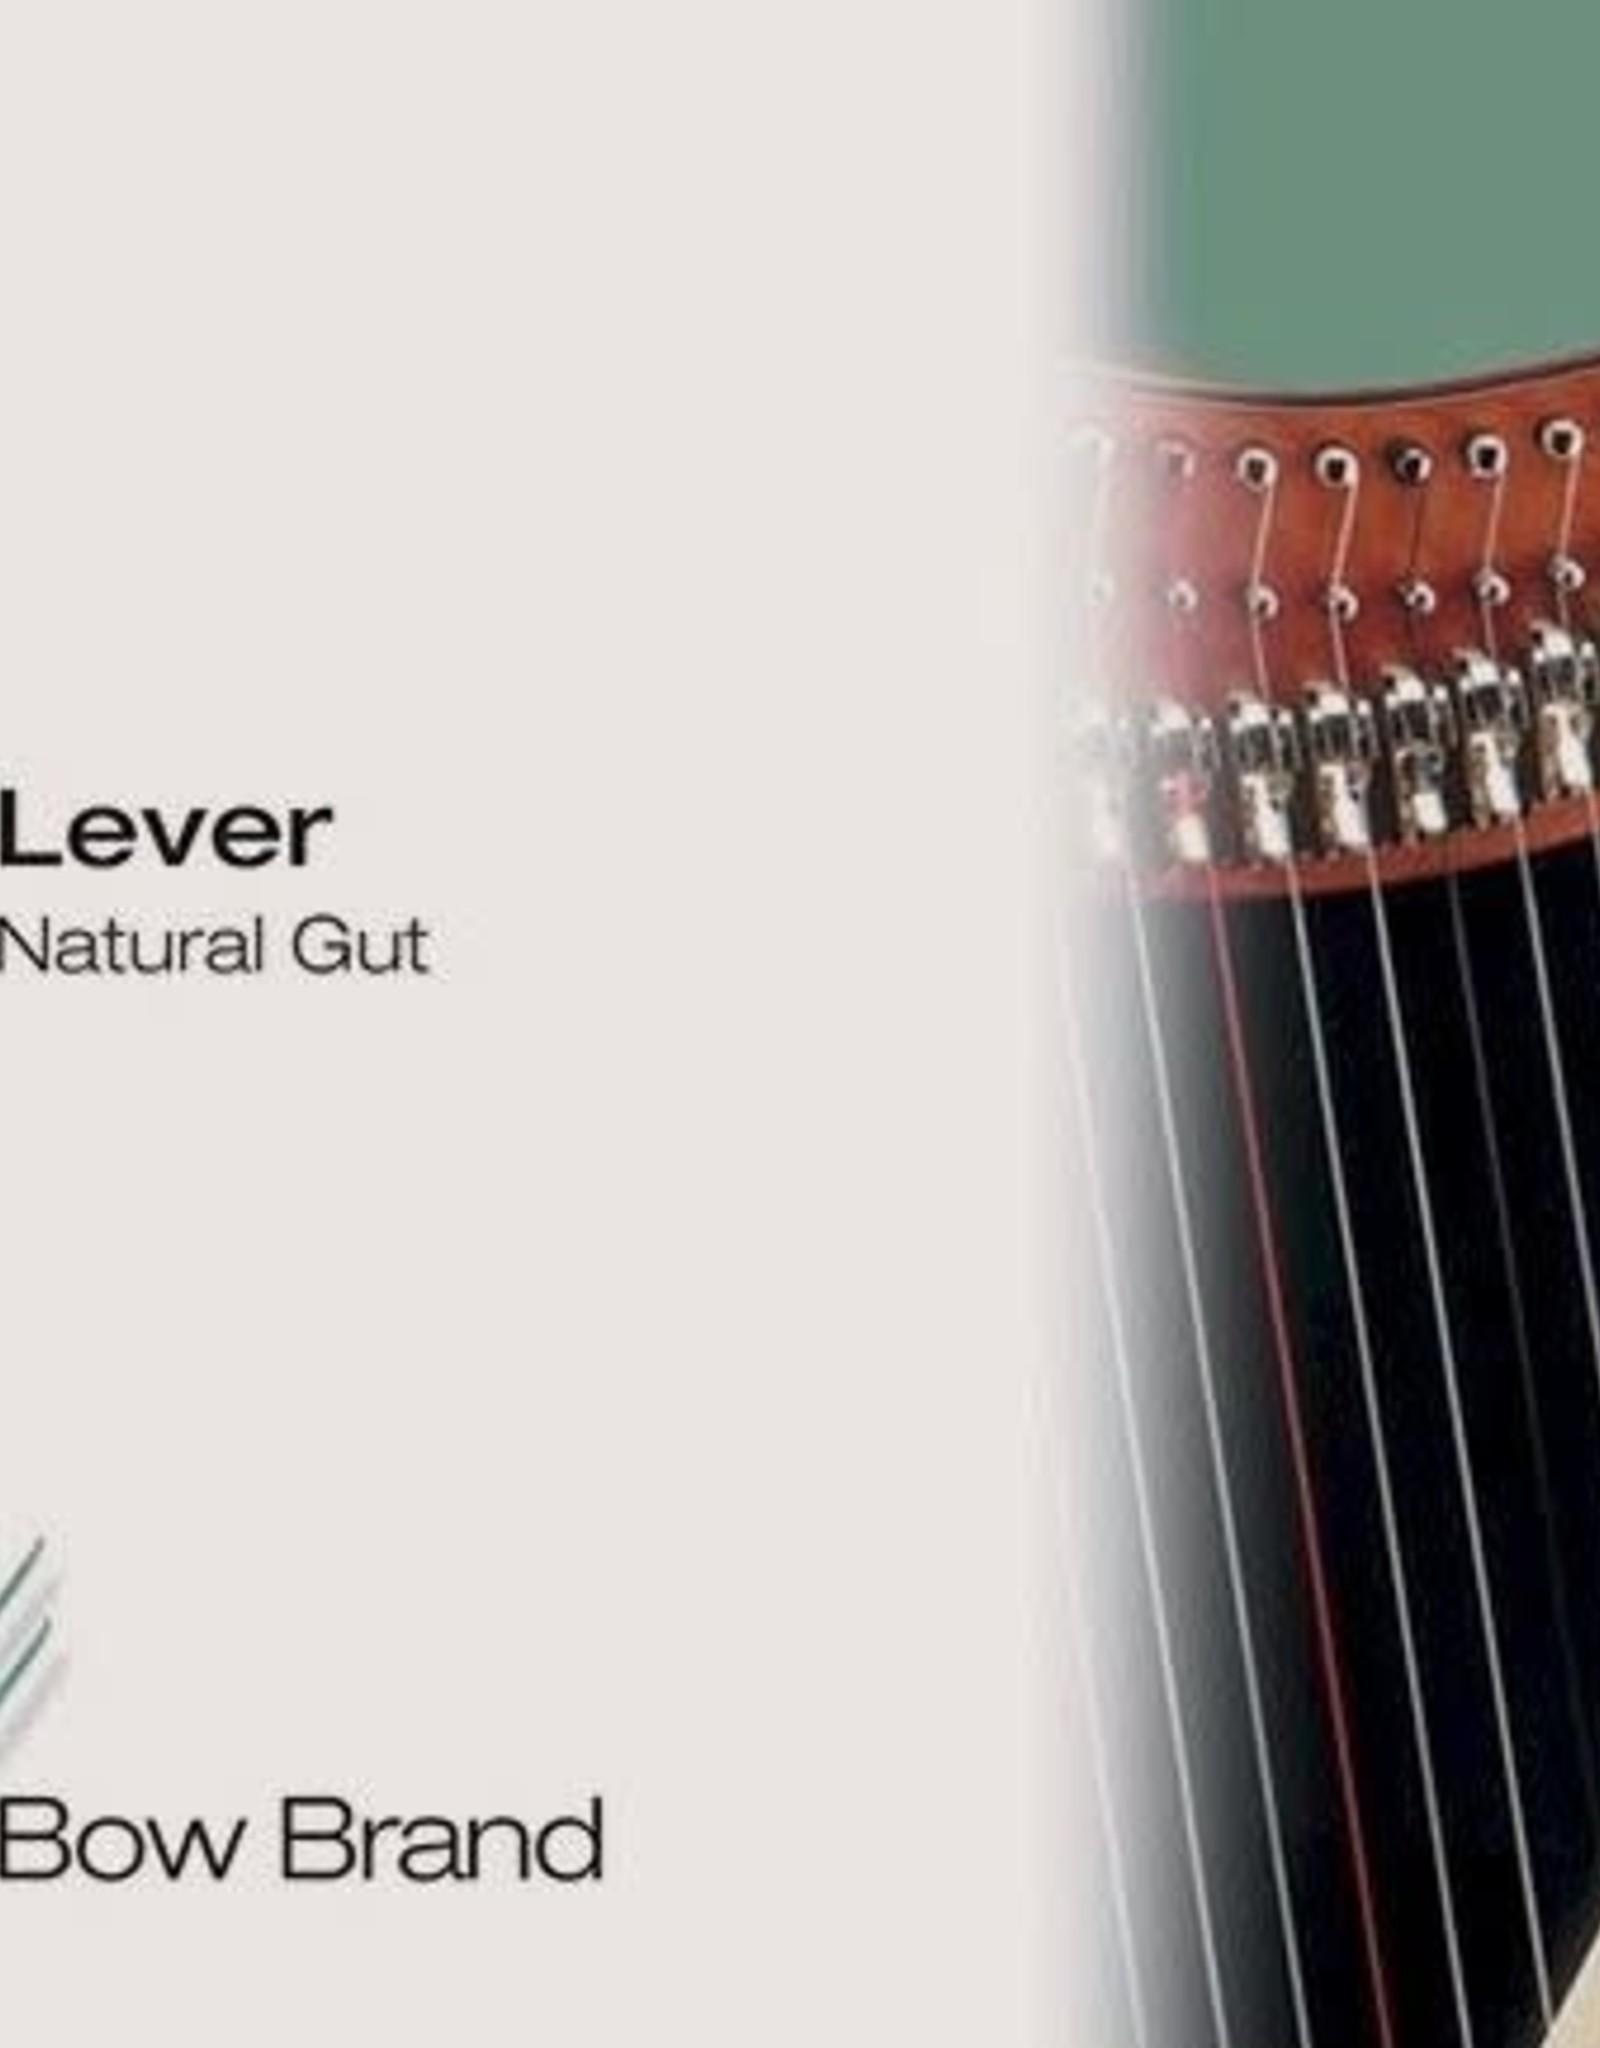 BOW BRAND  klep darm - lever GUT (set) 3de octaaf - inclusief 5% korting